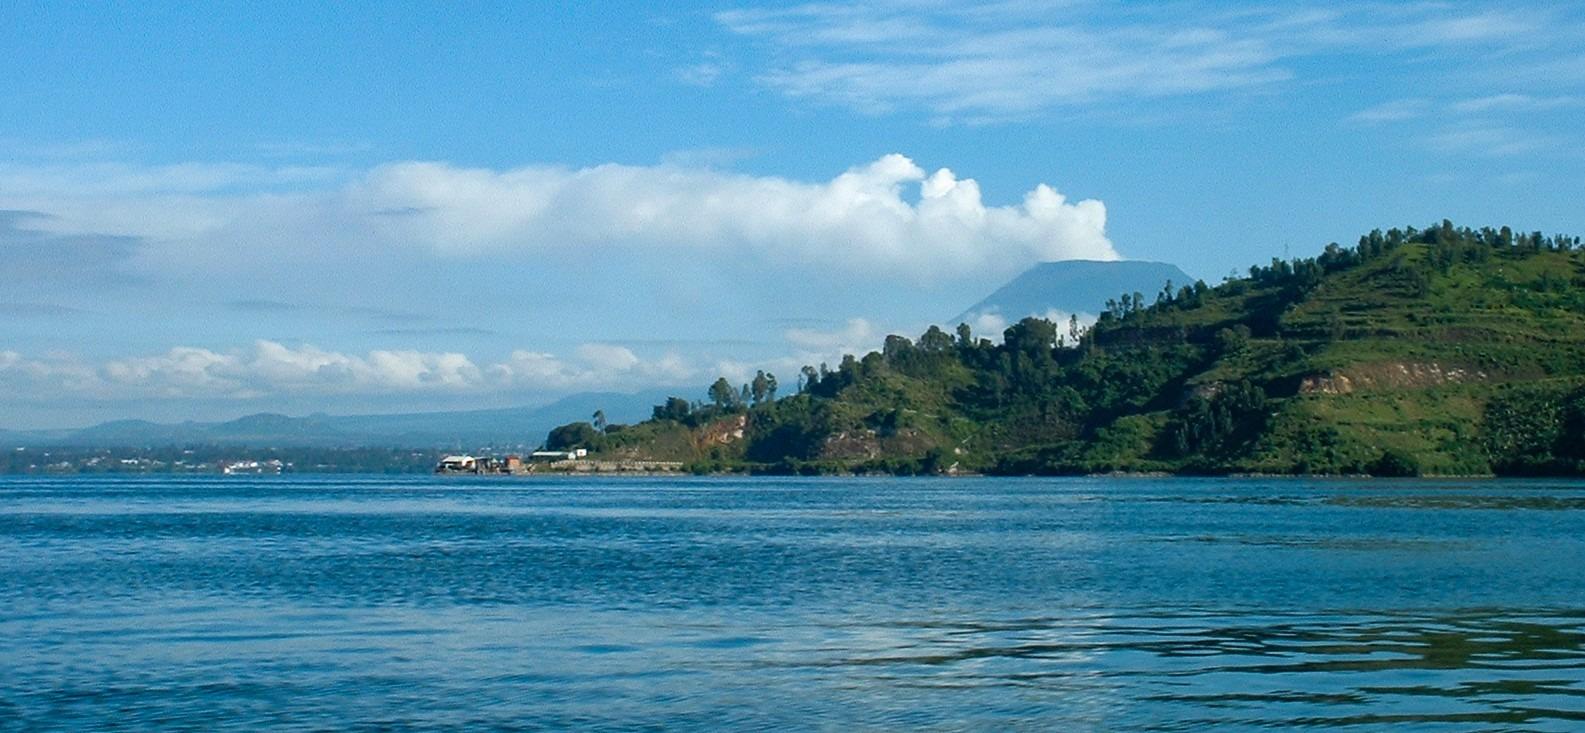 Lake Kivu Image - Hydragas Menu Page